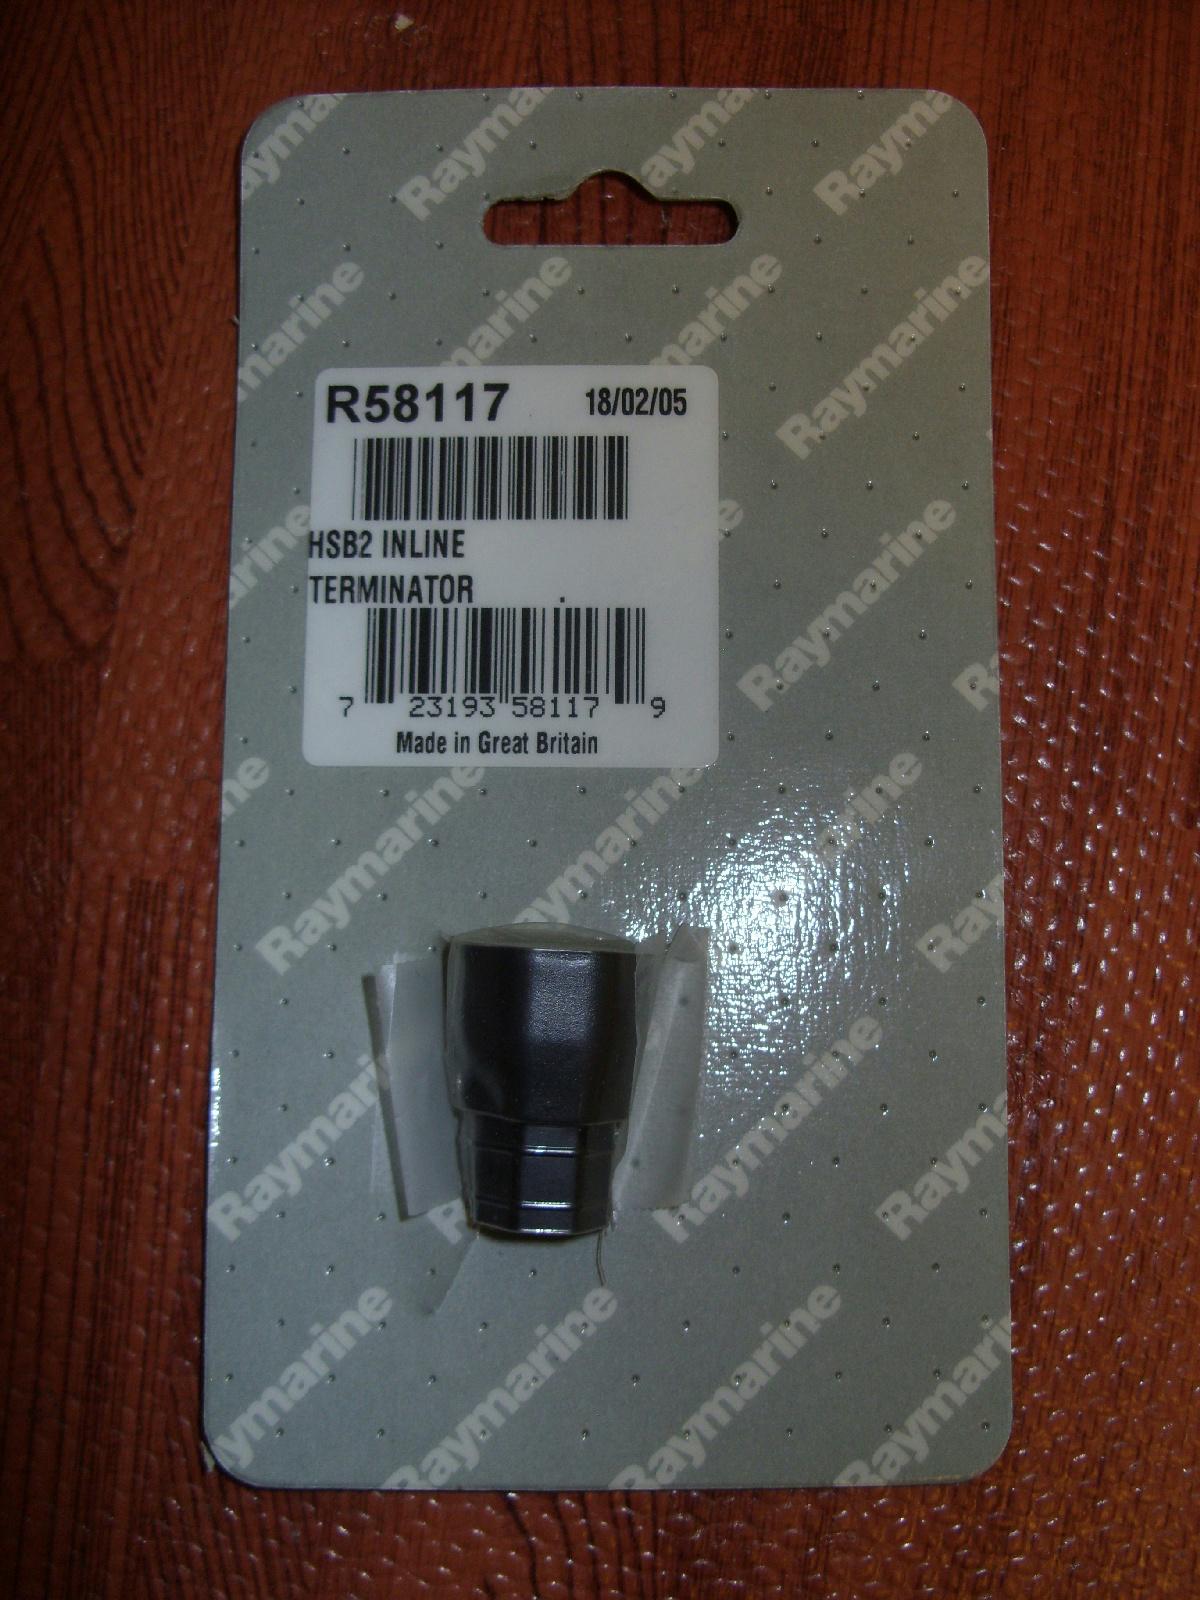 For Pathfinder Plus Terminating plug R58117 Raymarine HSB2 Inline Terminator